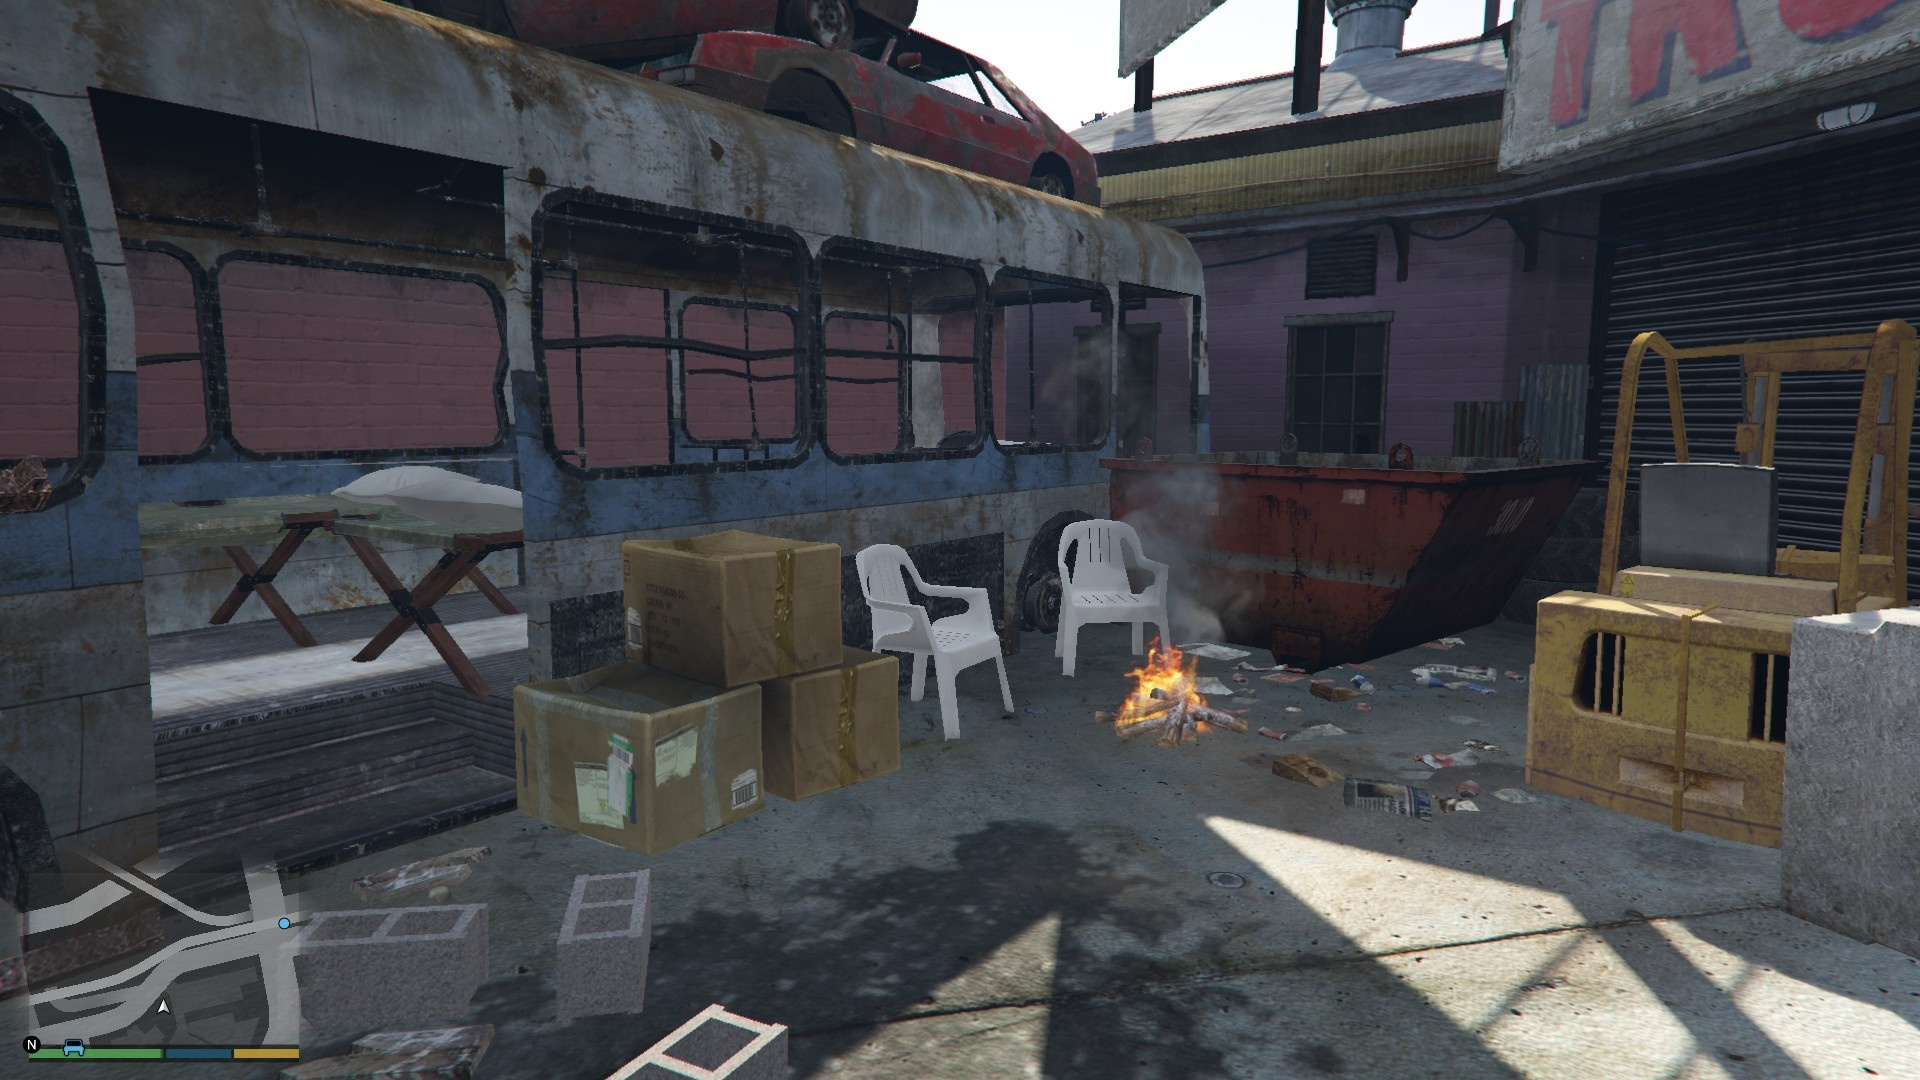 Zombie Survival Camp - Gta5-Mods innen Zombie Apocalypse Survival Training